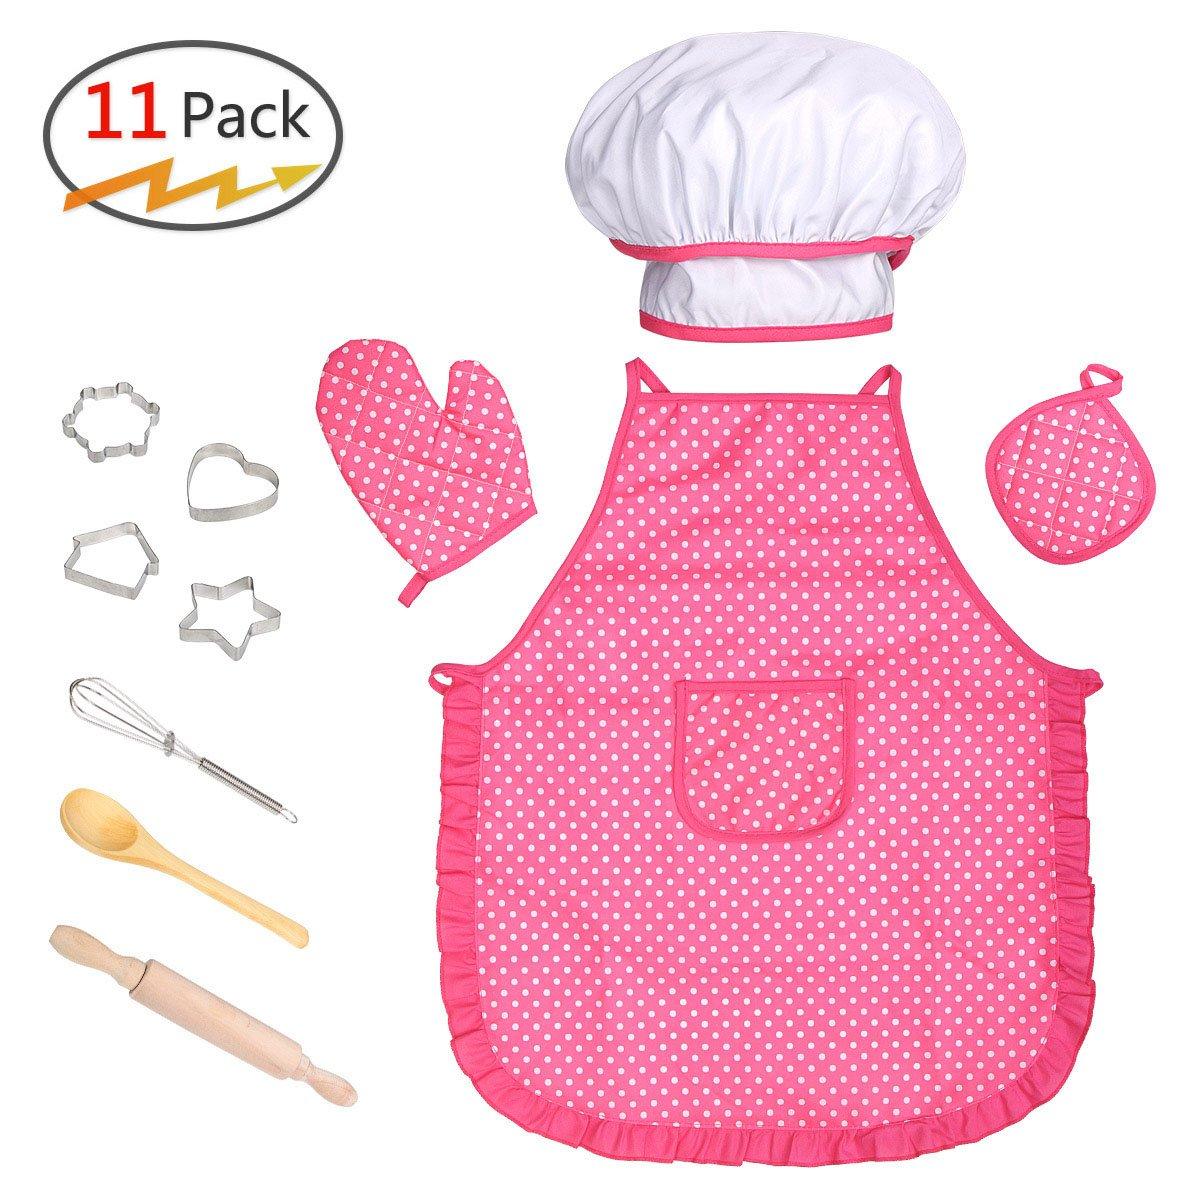 Kids Cooking Baking Set, Kids Chef Costume Pretend Role Play Set 11 PCS